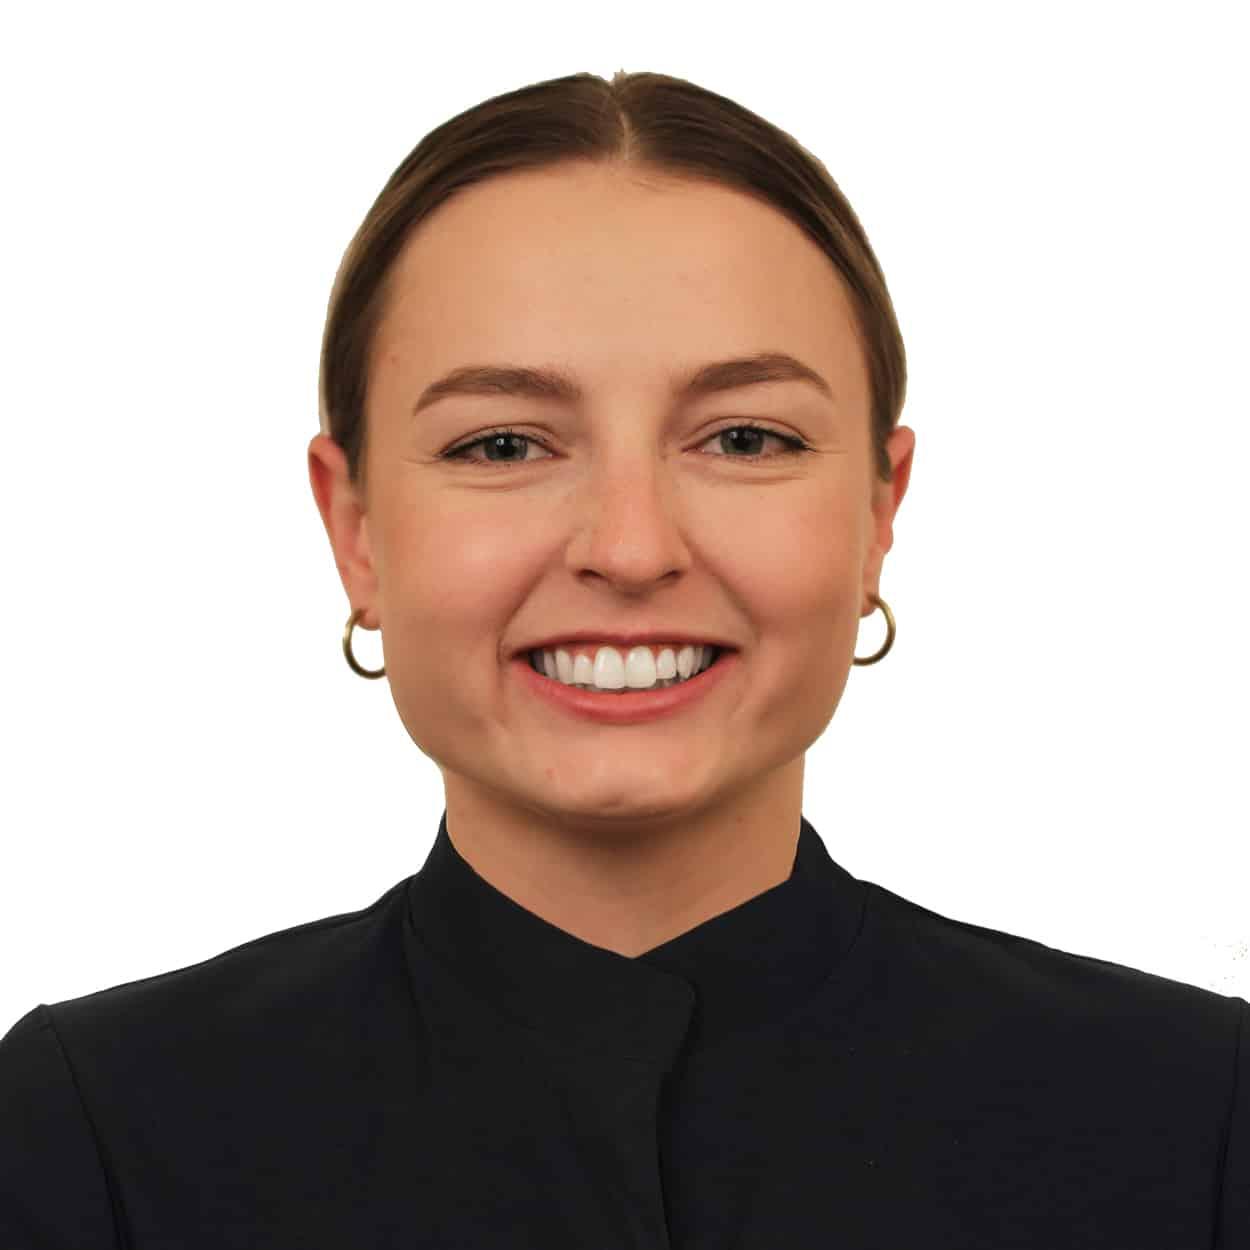 Grace Holsworth